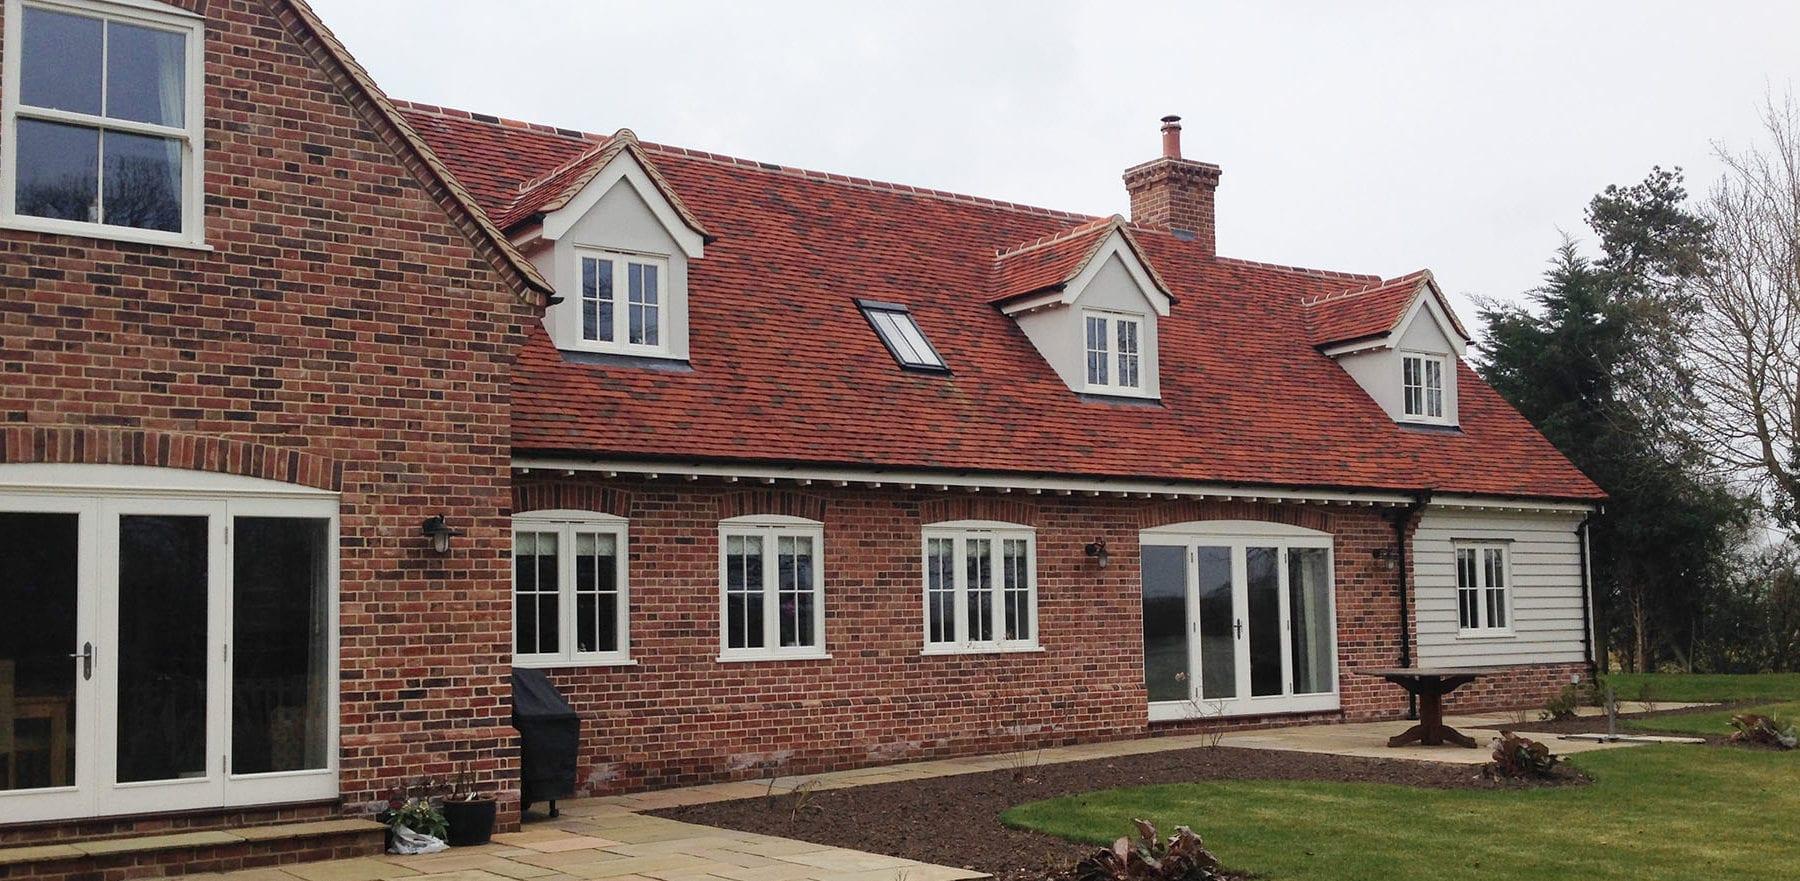 Lifestiles - Handmade Multi Clay Roof Tiles - Takeley, England 4